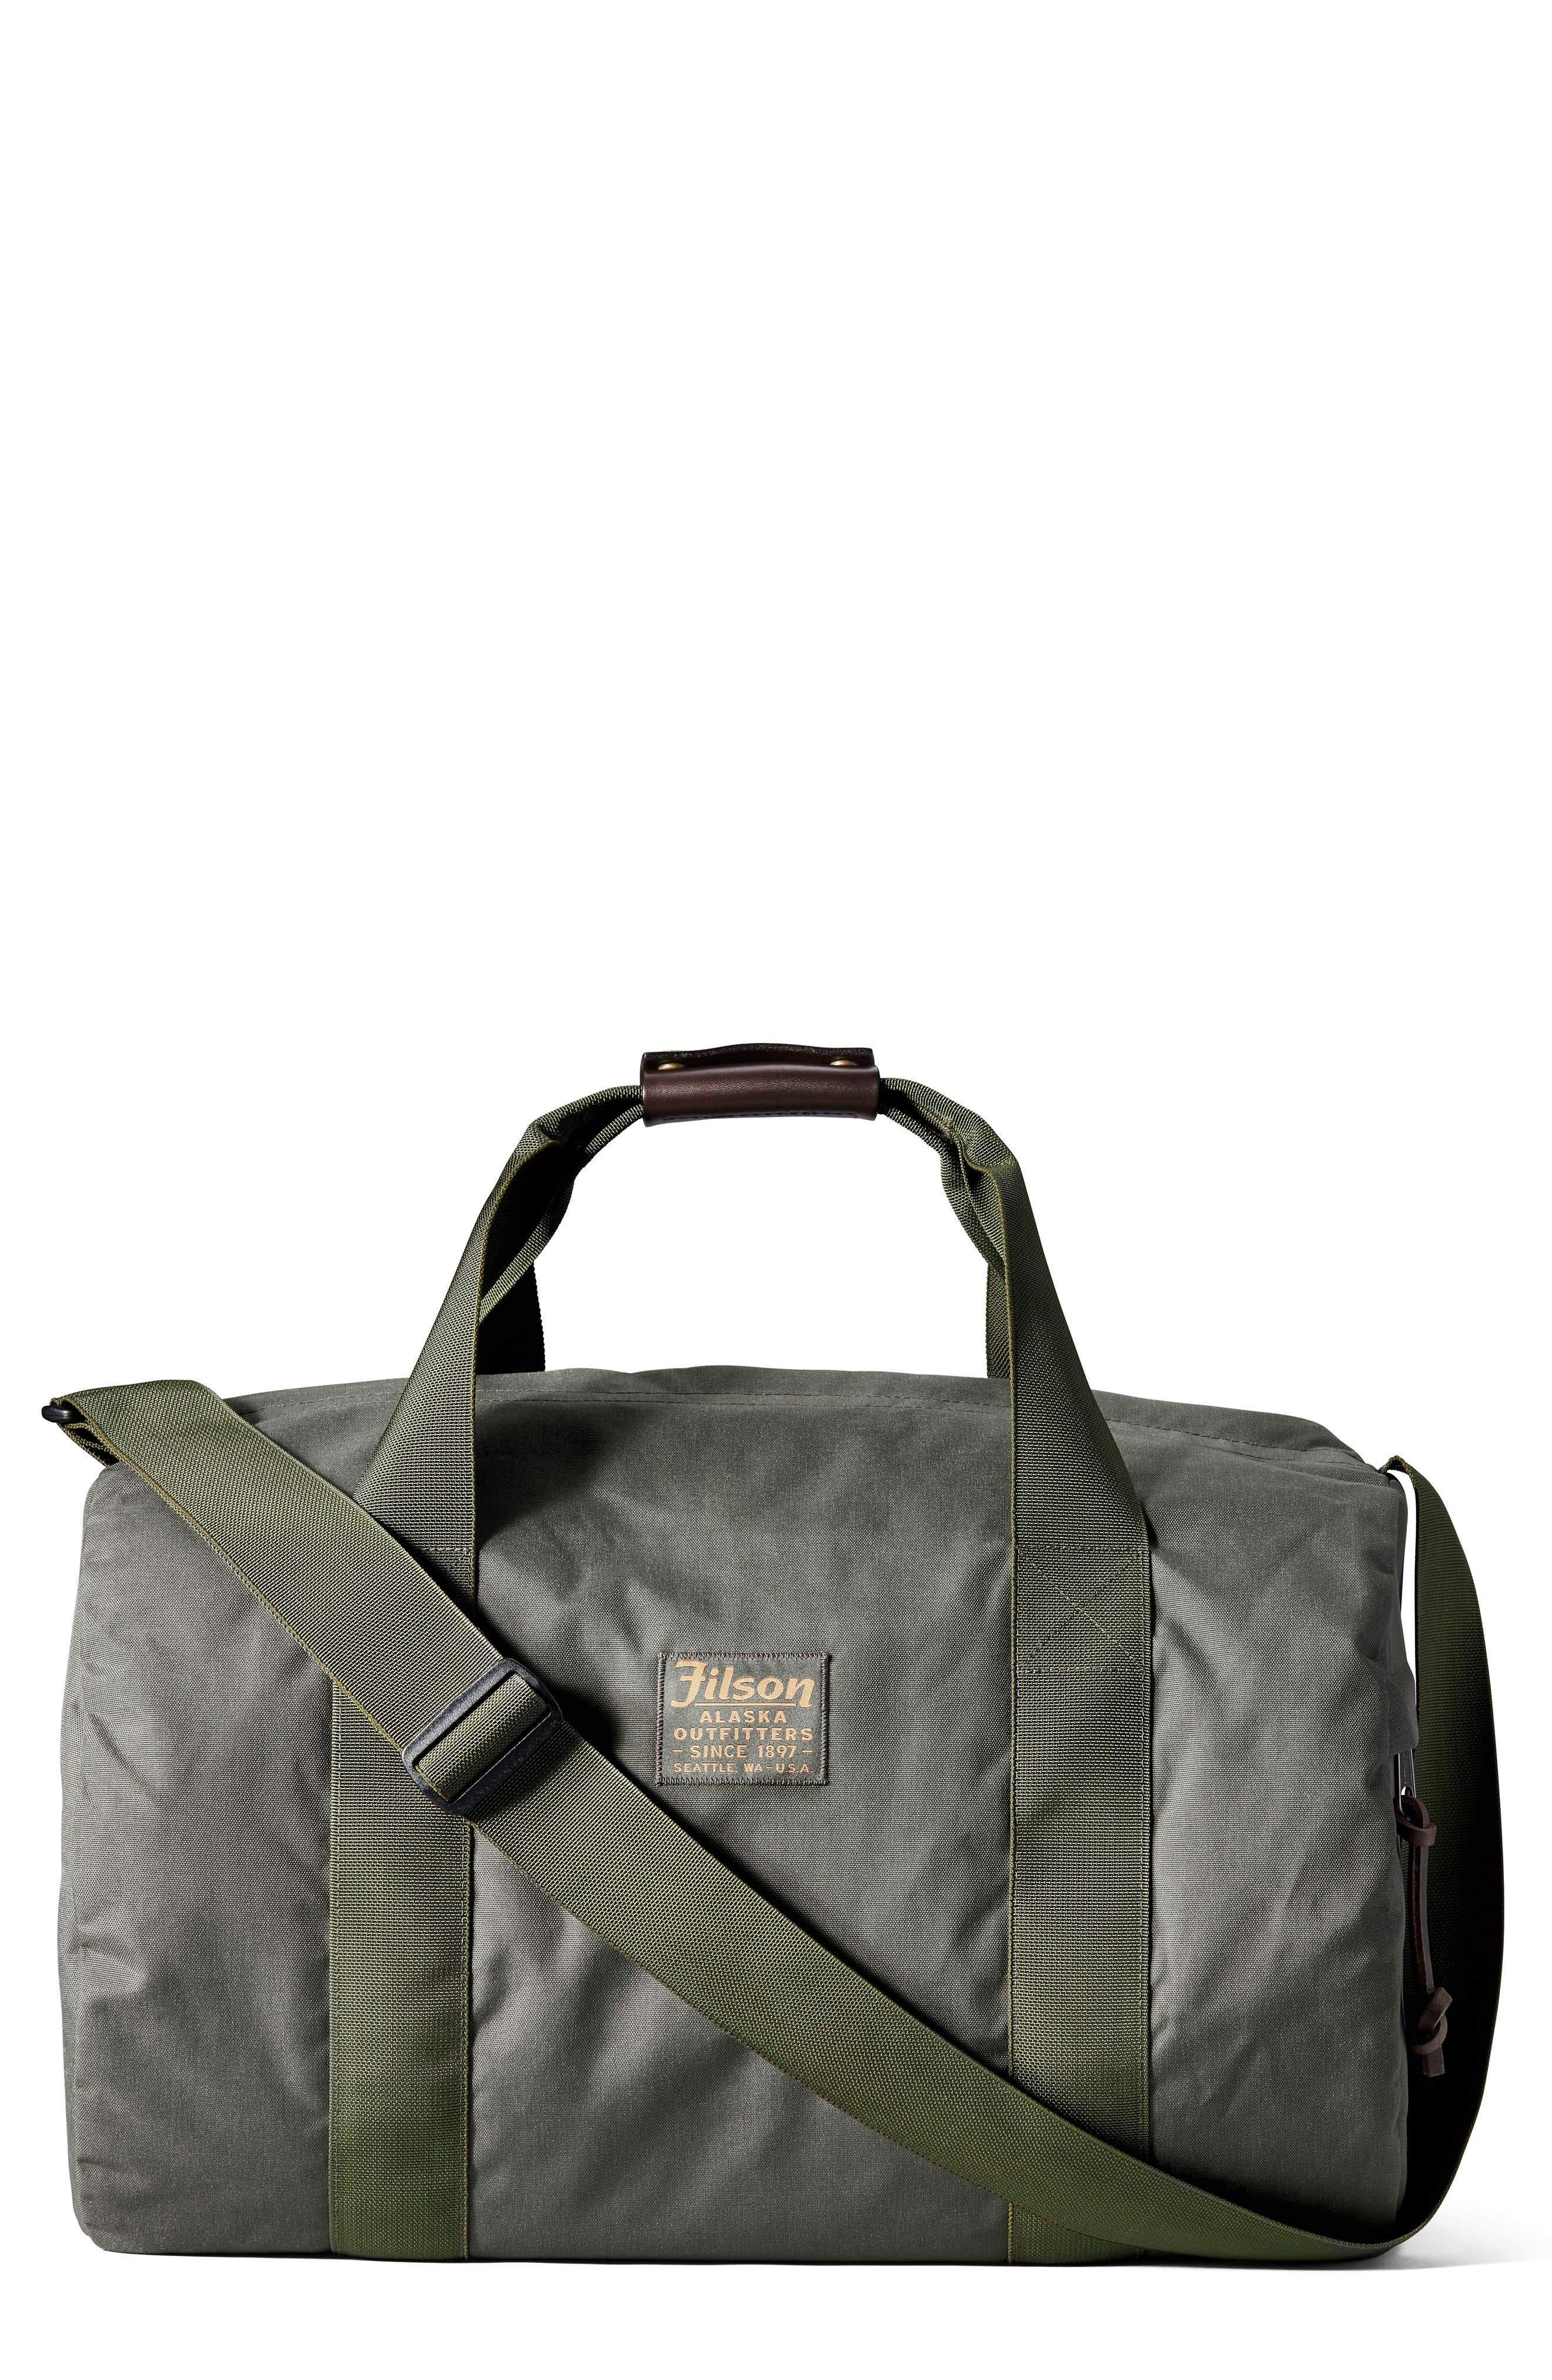 Filson Barrel Duffel Bag